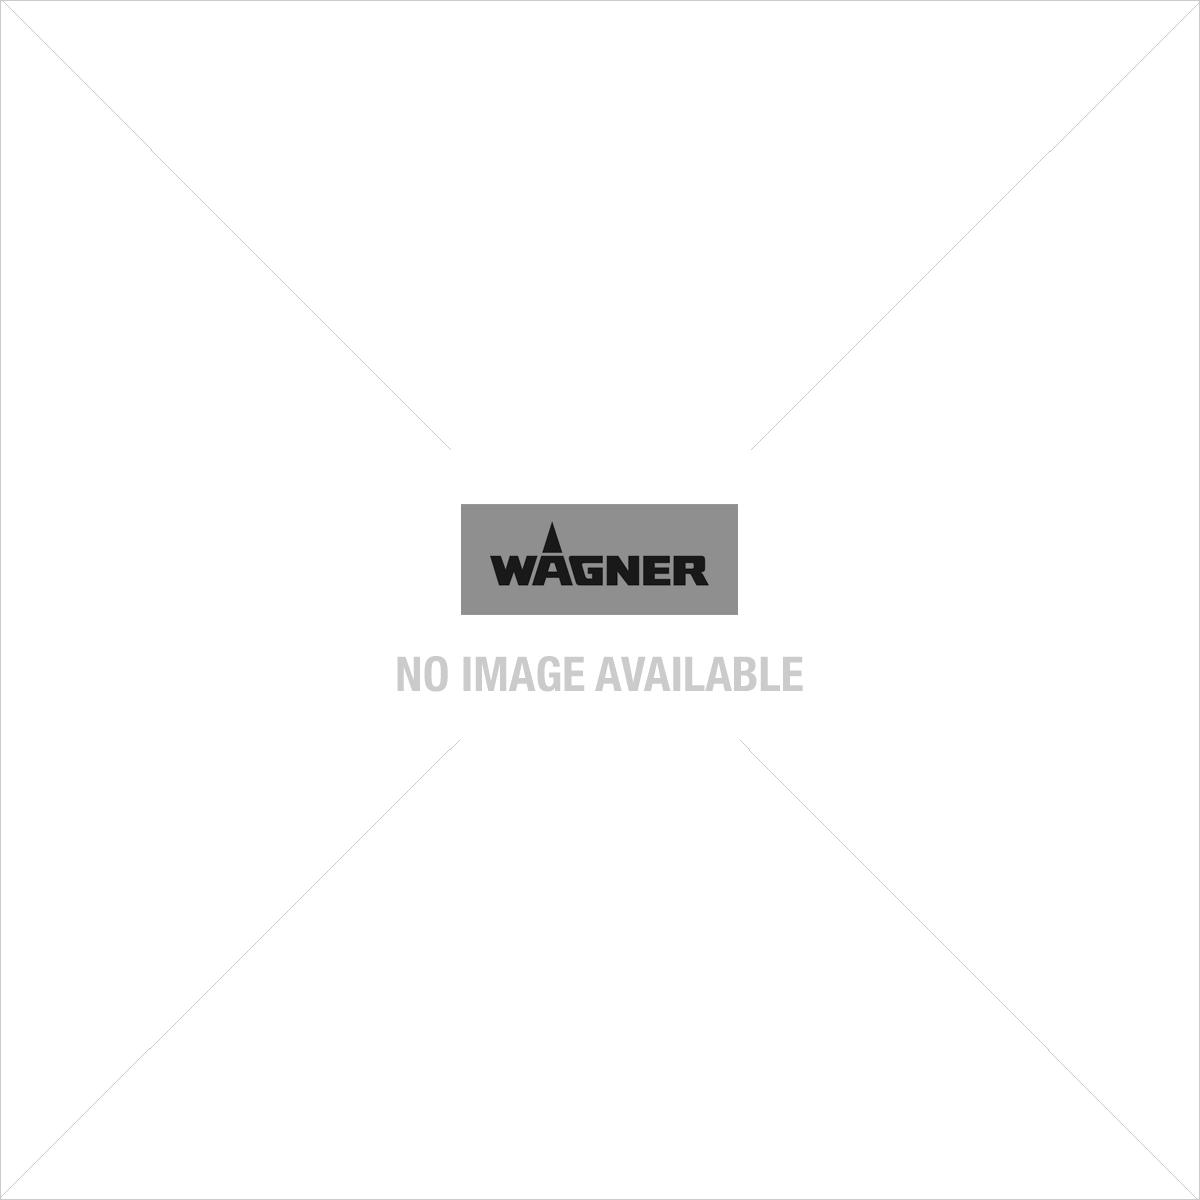 Kit de masquage peinture Wagner